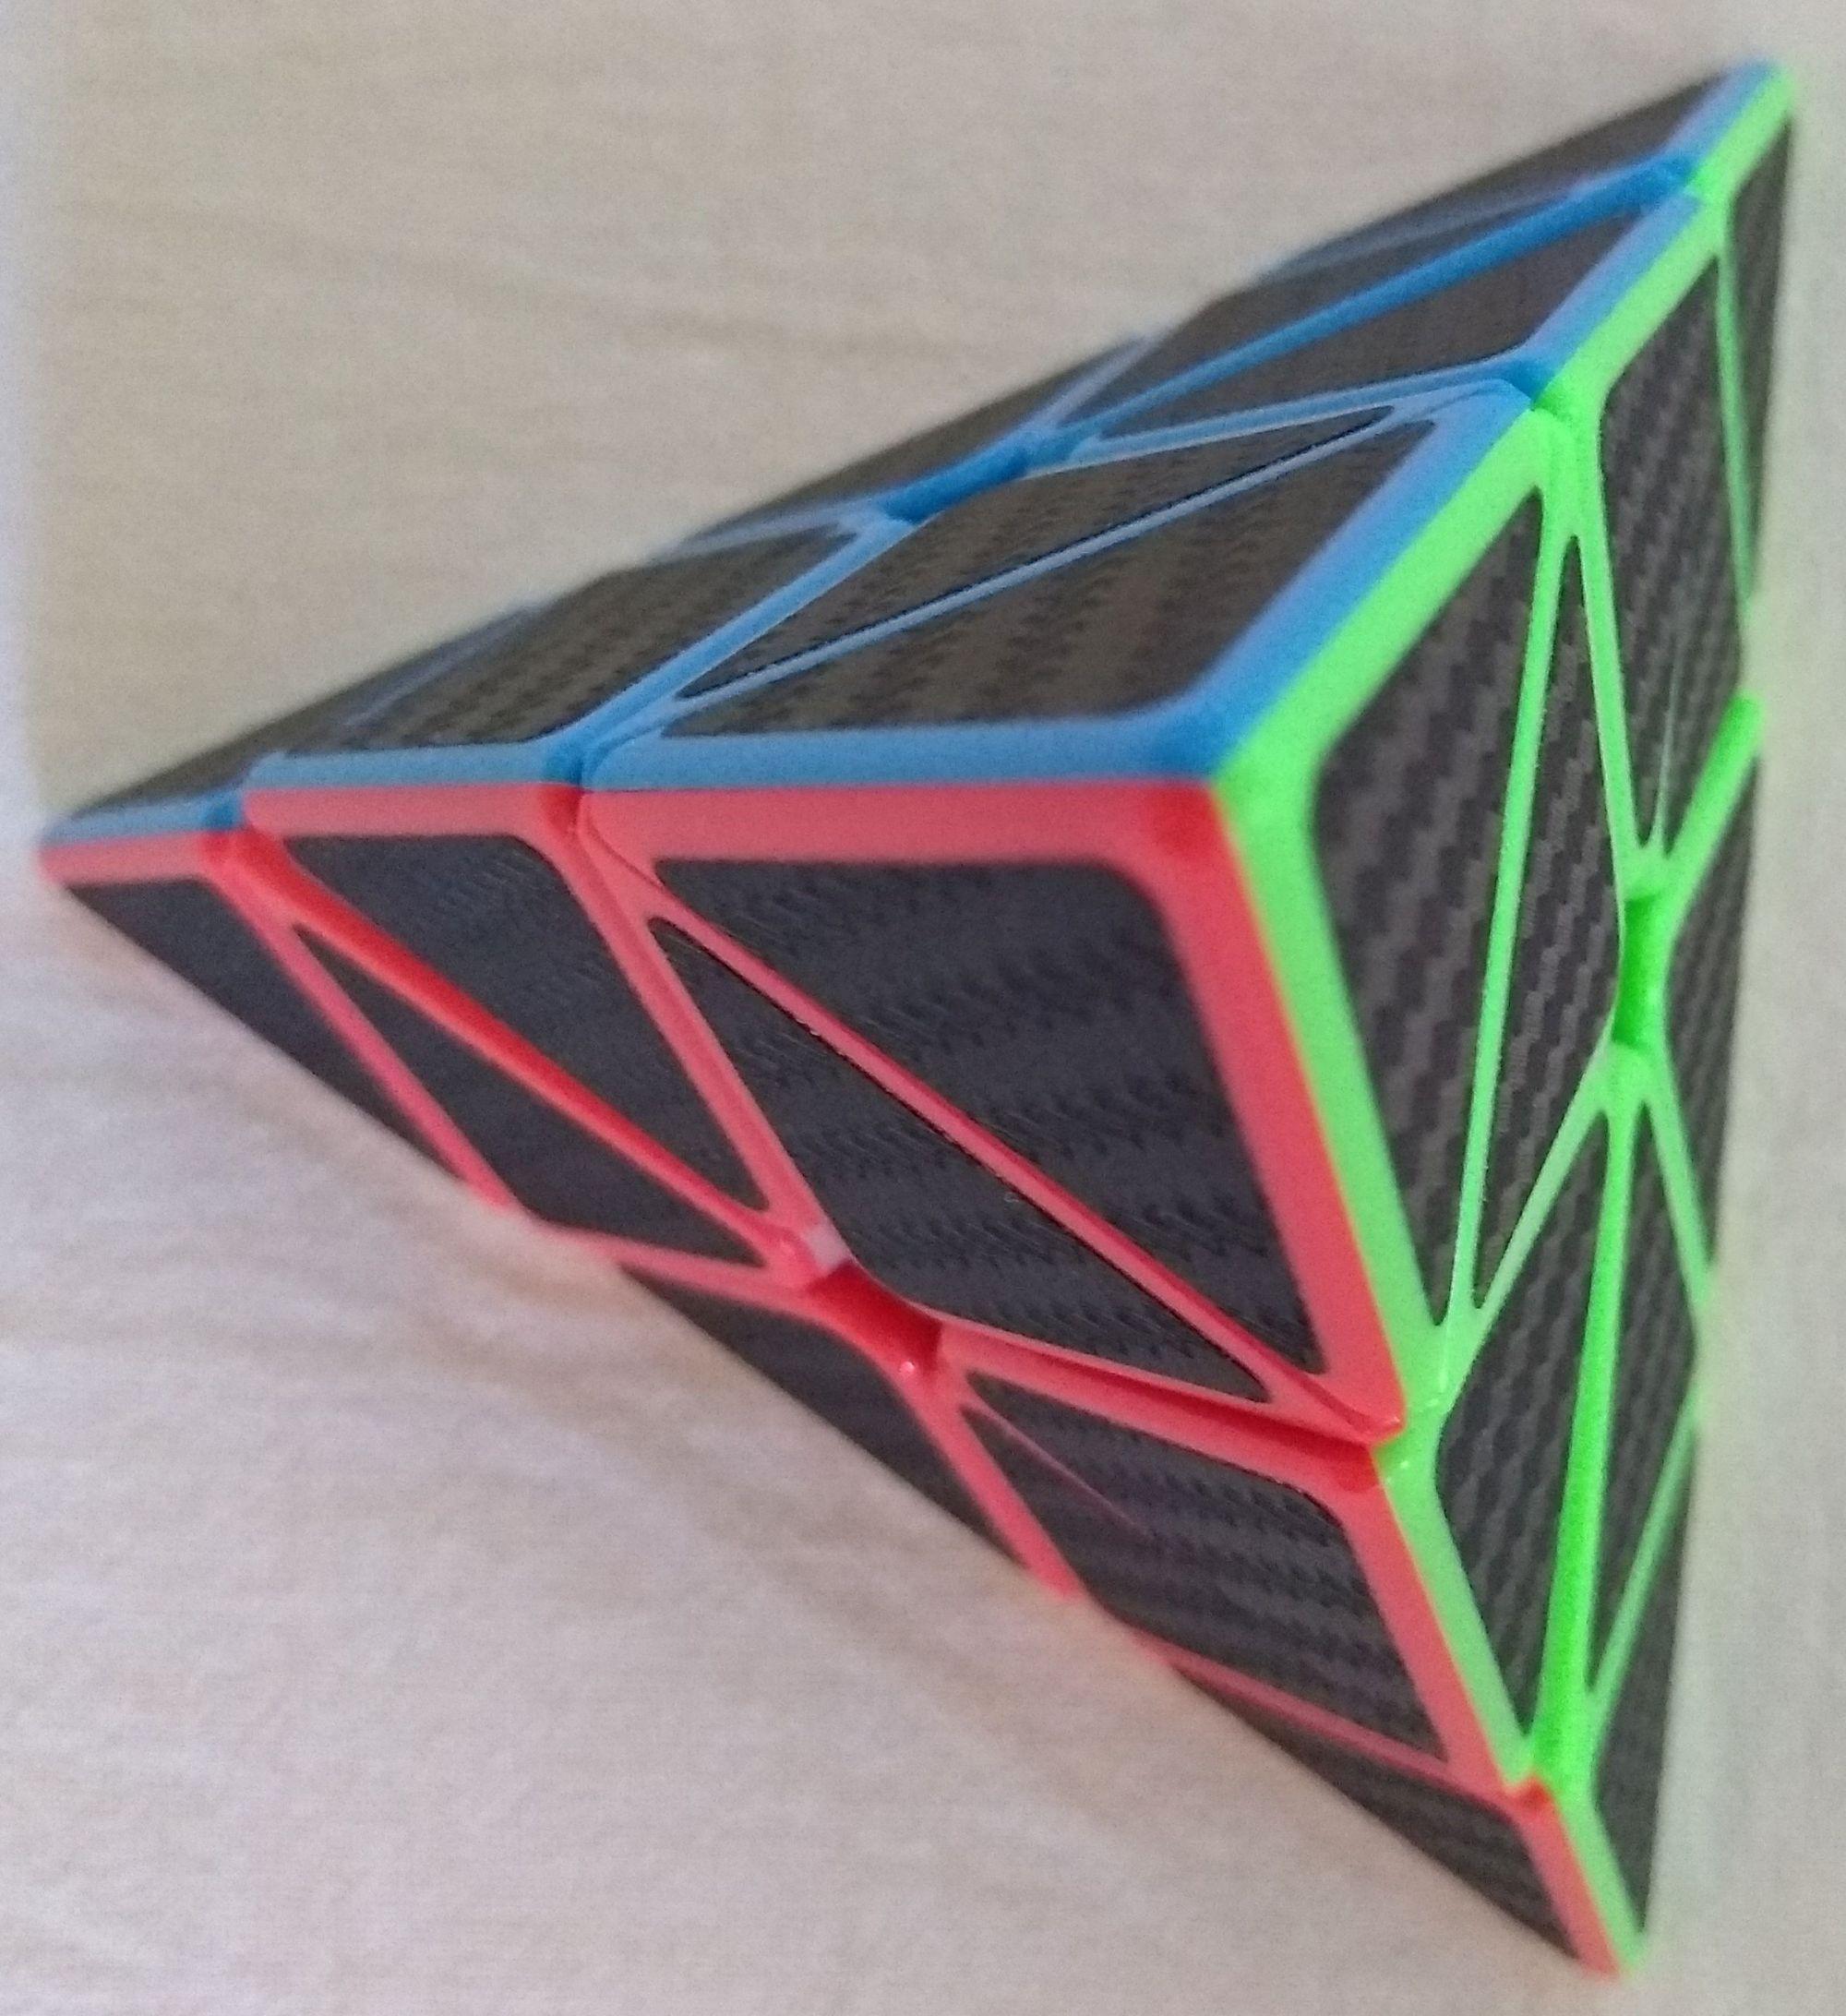 Pyraminx solved